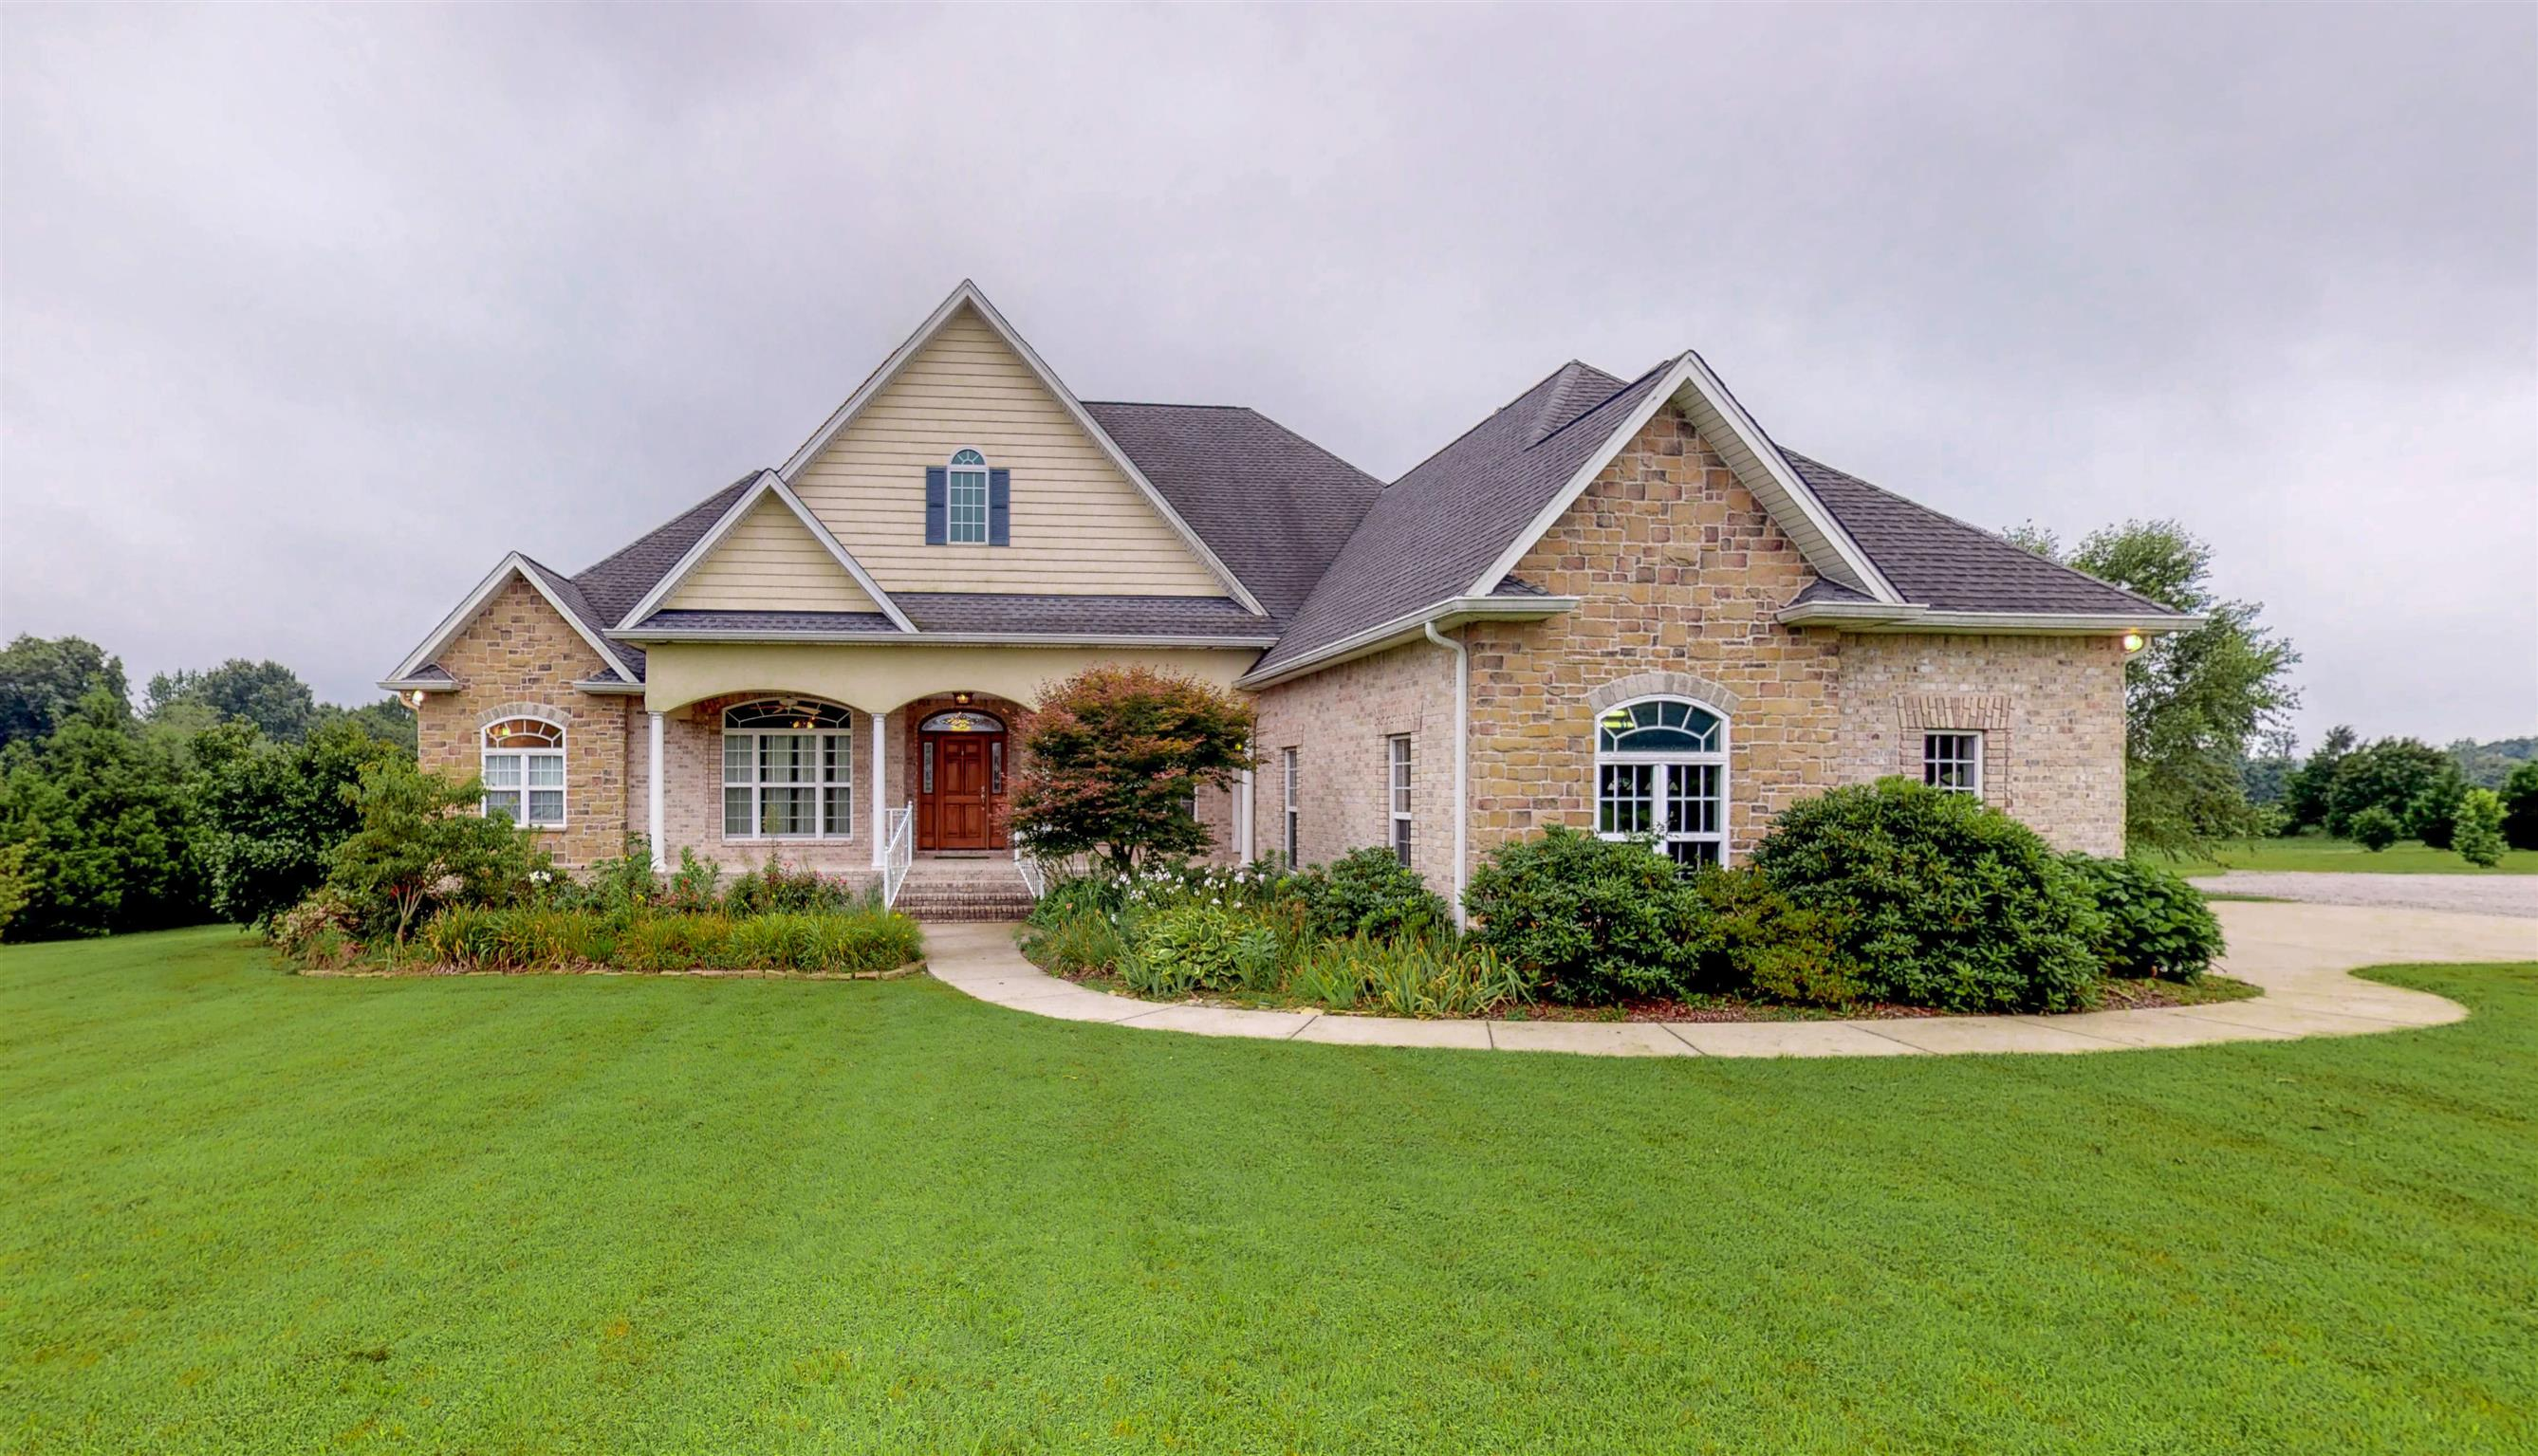 490 Gregory Rd, Westmoreland, TN 37186 - Westmoreland, TN real estate listing